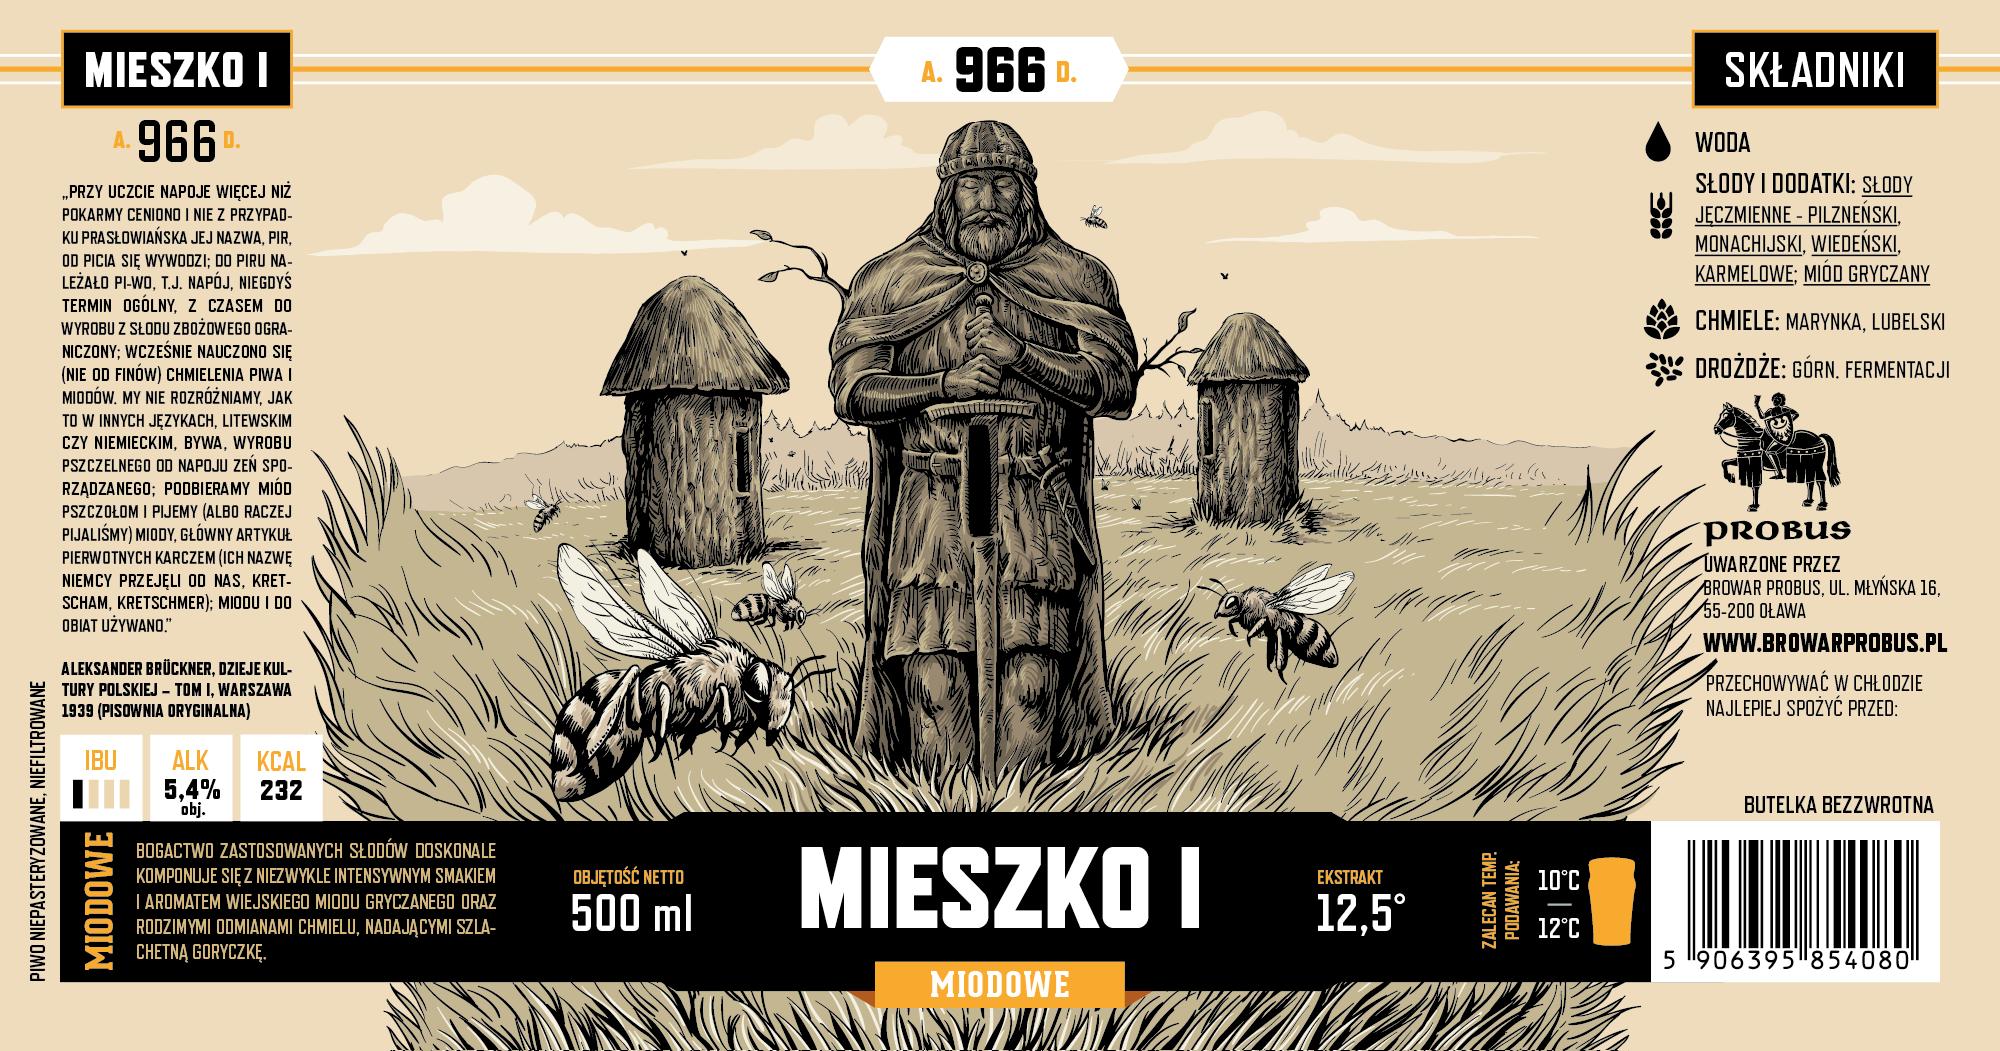 probus-mieszkoi-966-200x1053mm